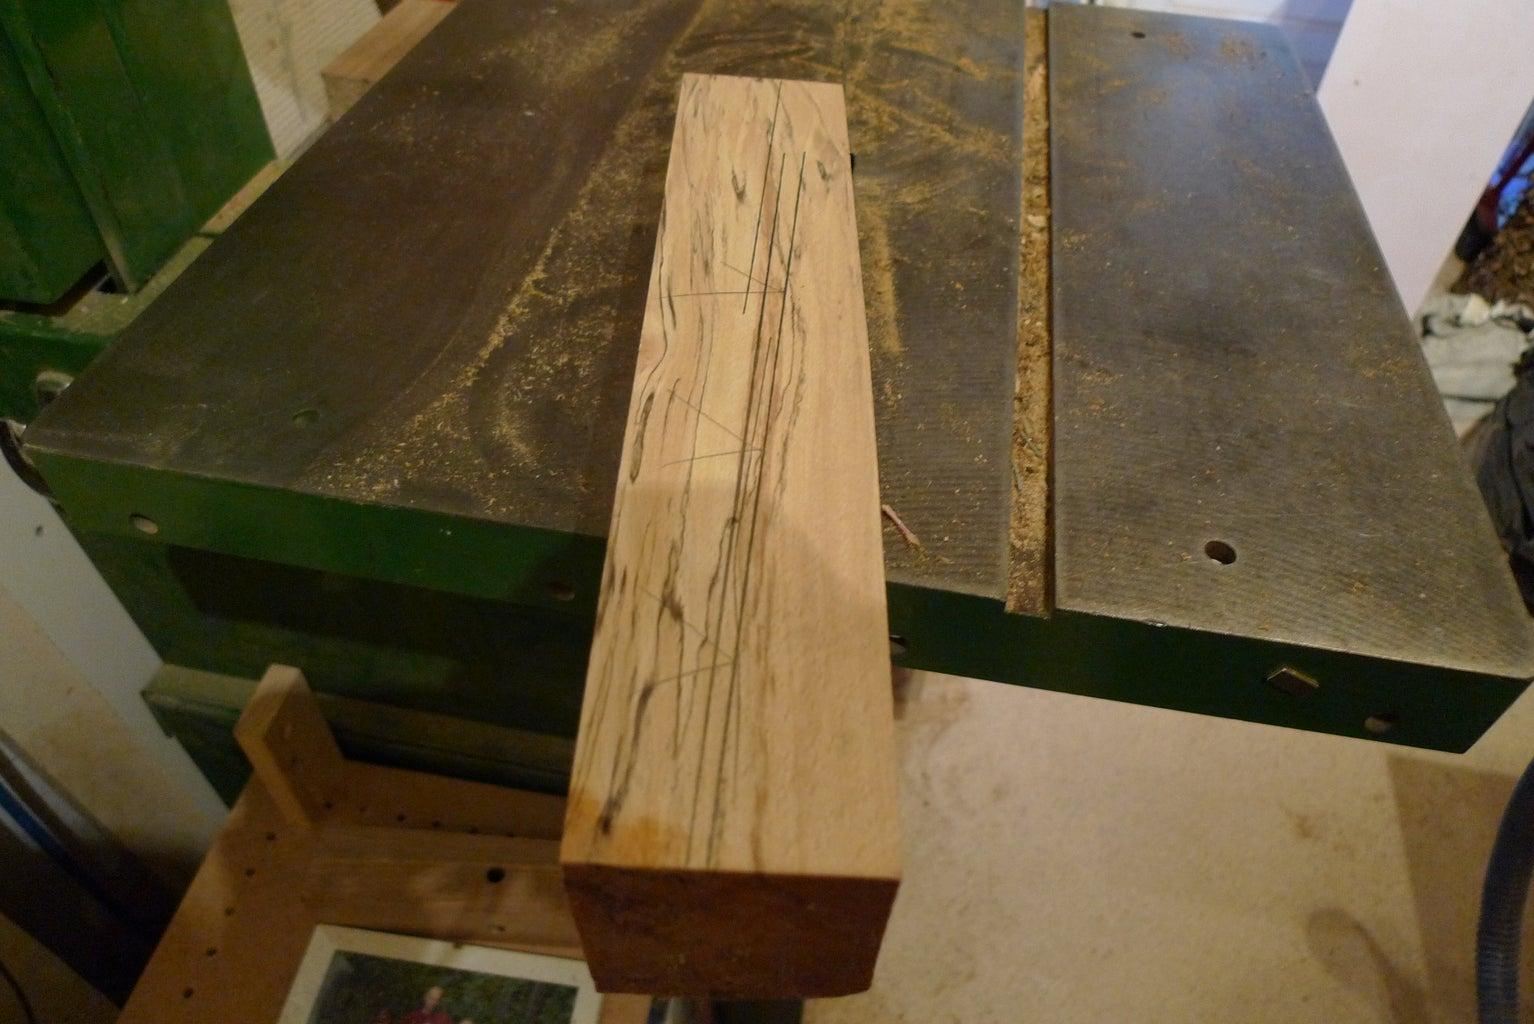 Concept, Materials and Tools